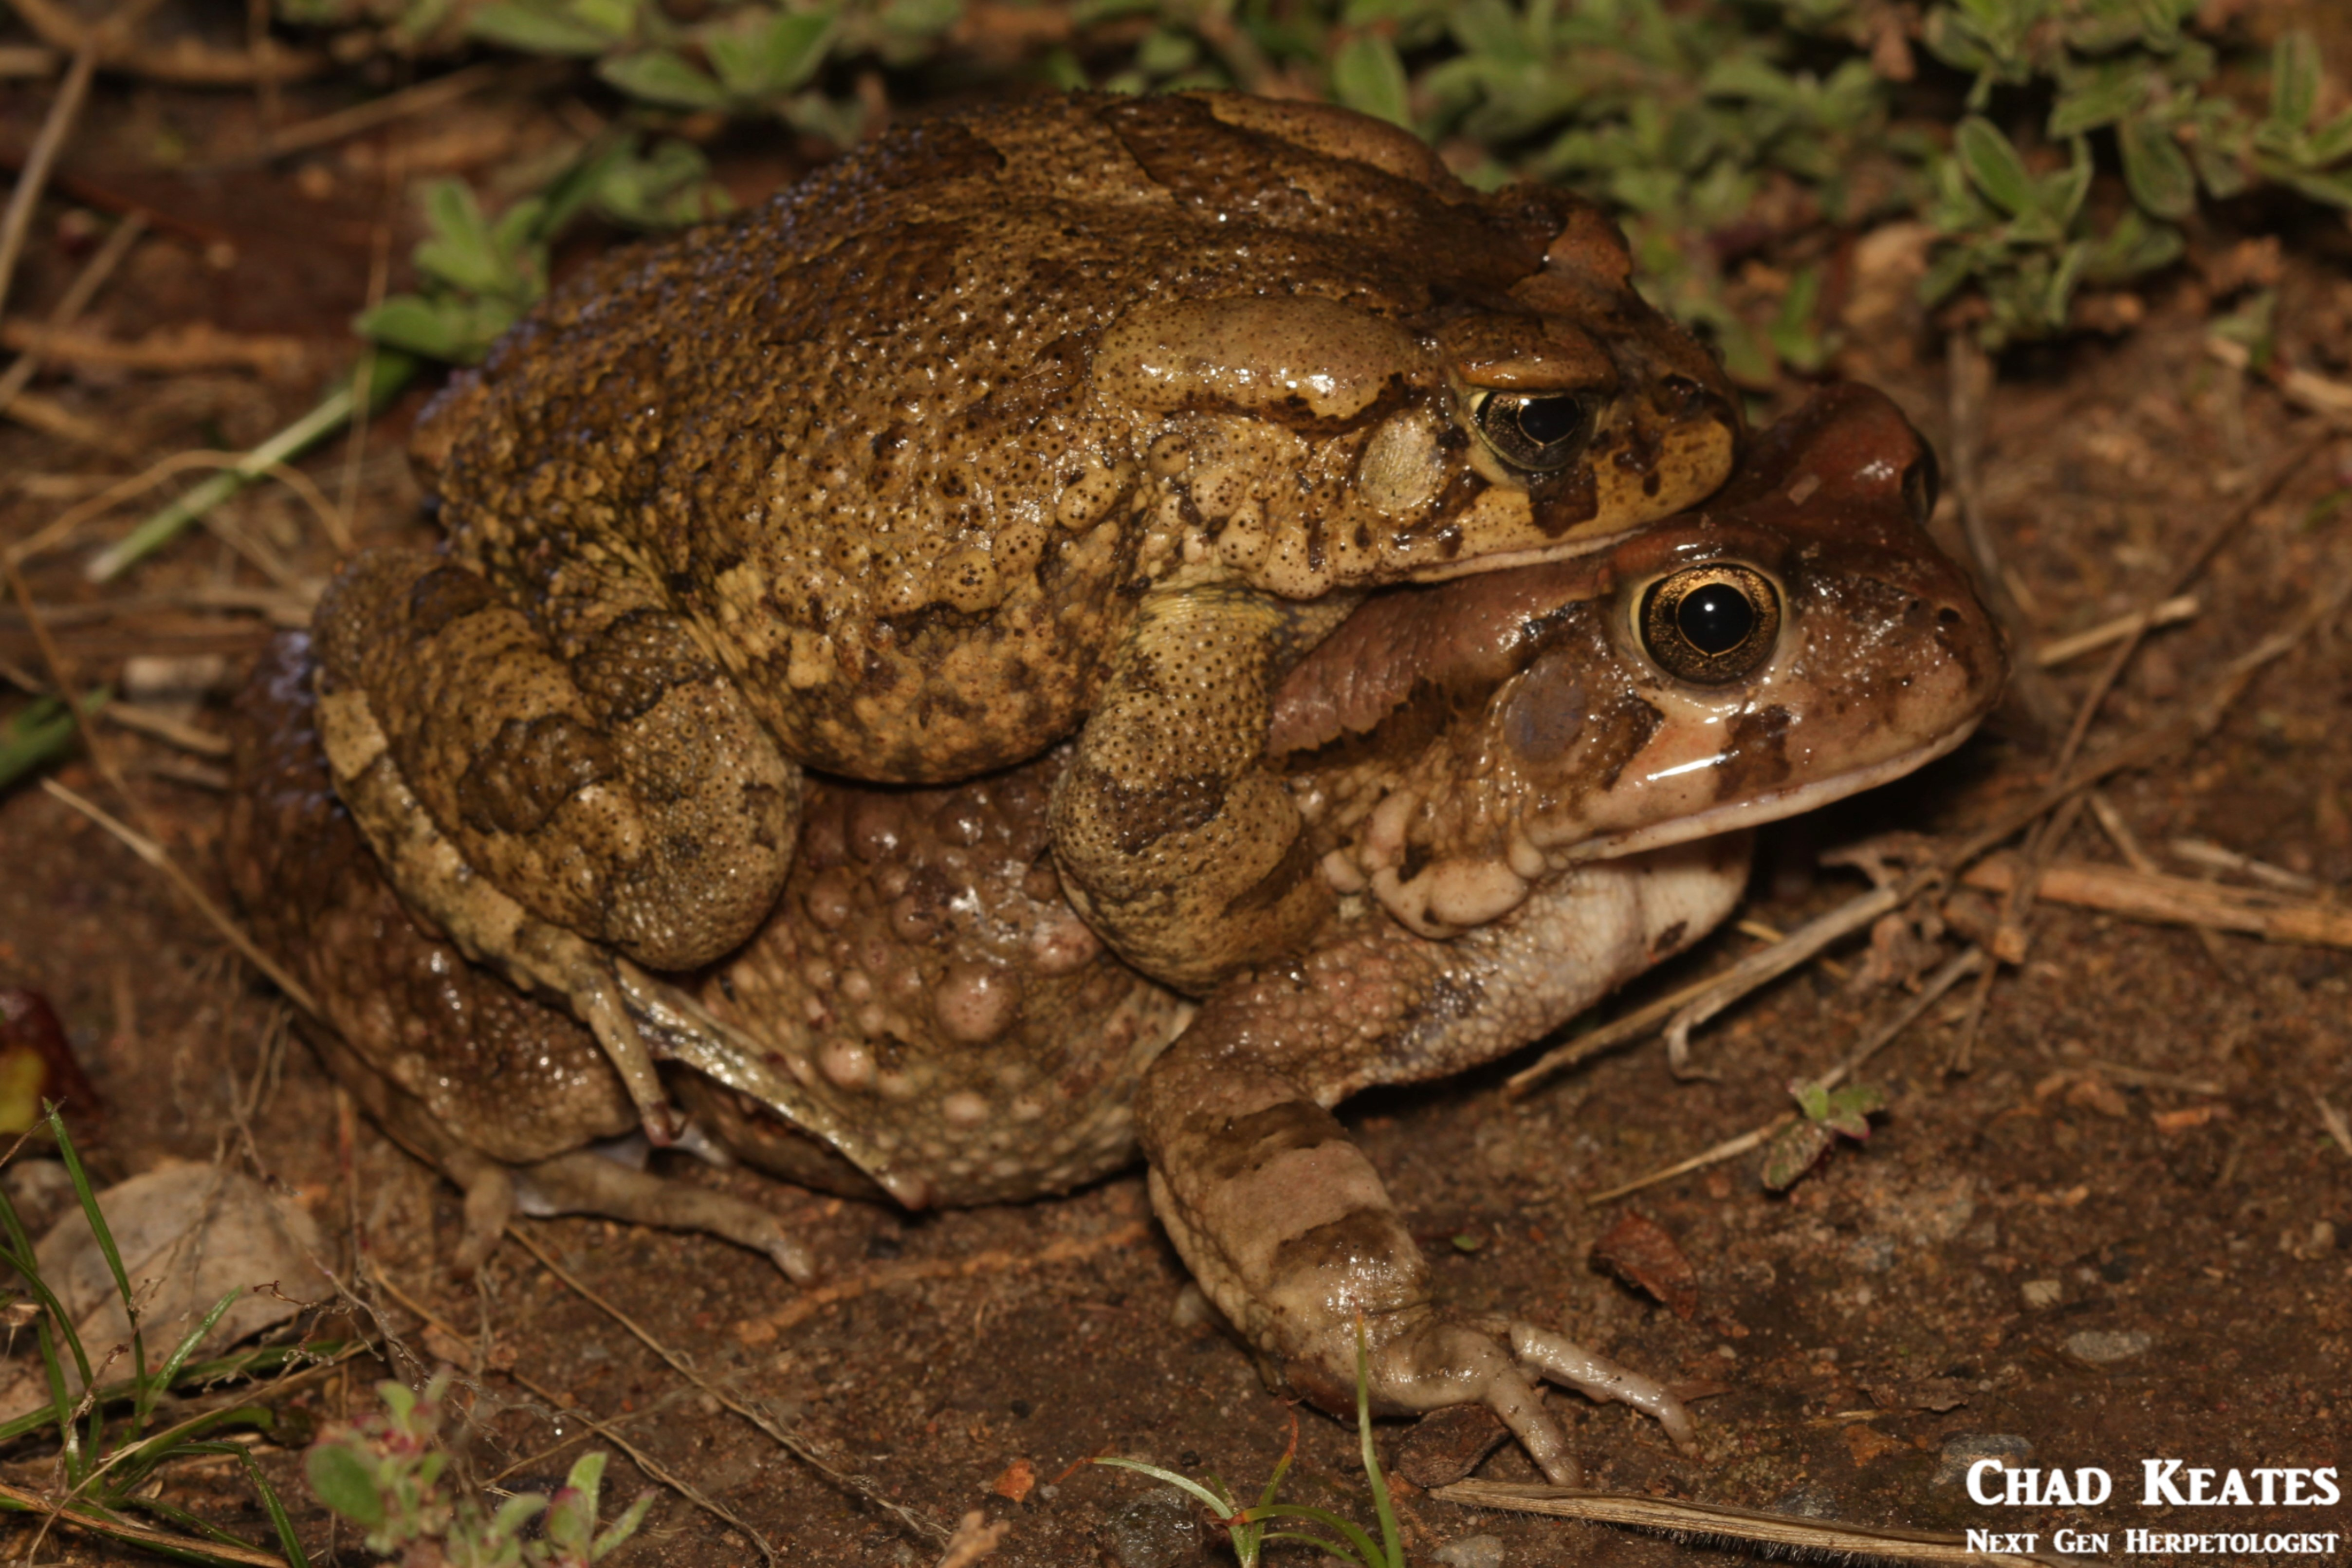 Sclerophrys_rangeri_Raucous_Toad_Chad_Keates